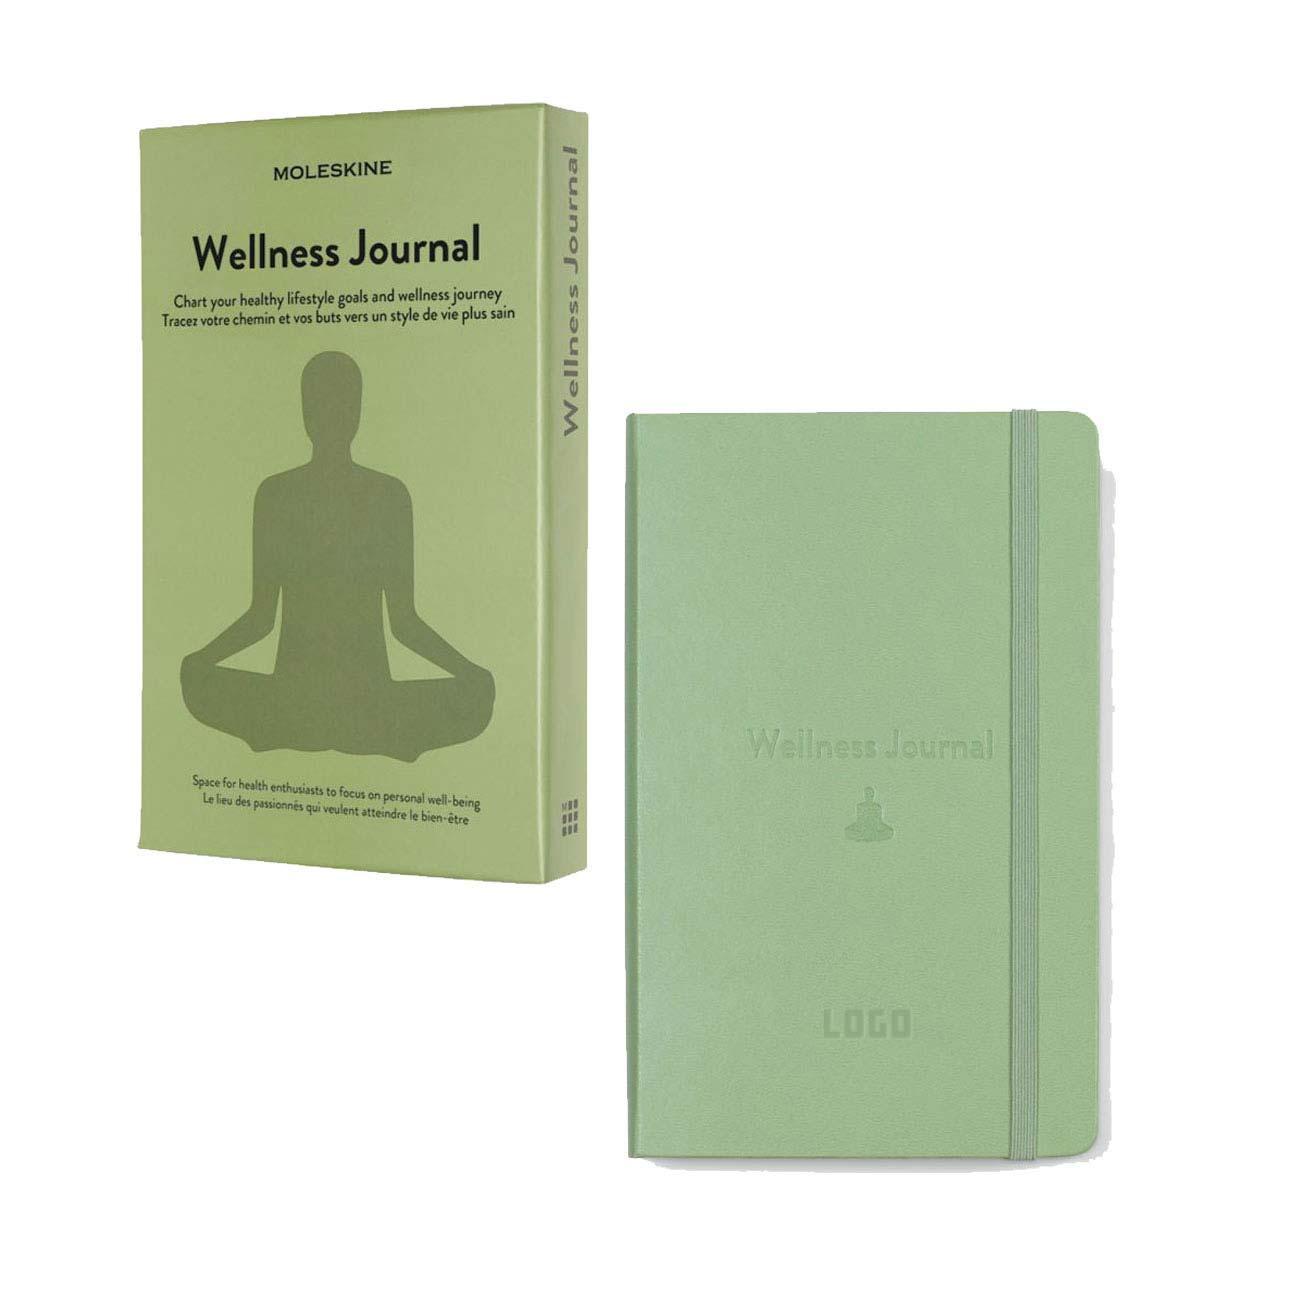 356157 wellness hardcover journal one location blind deboss